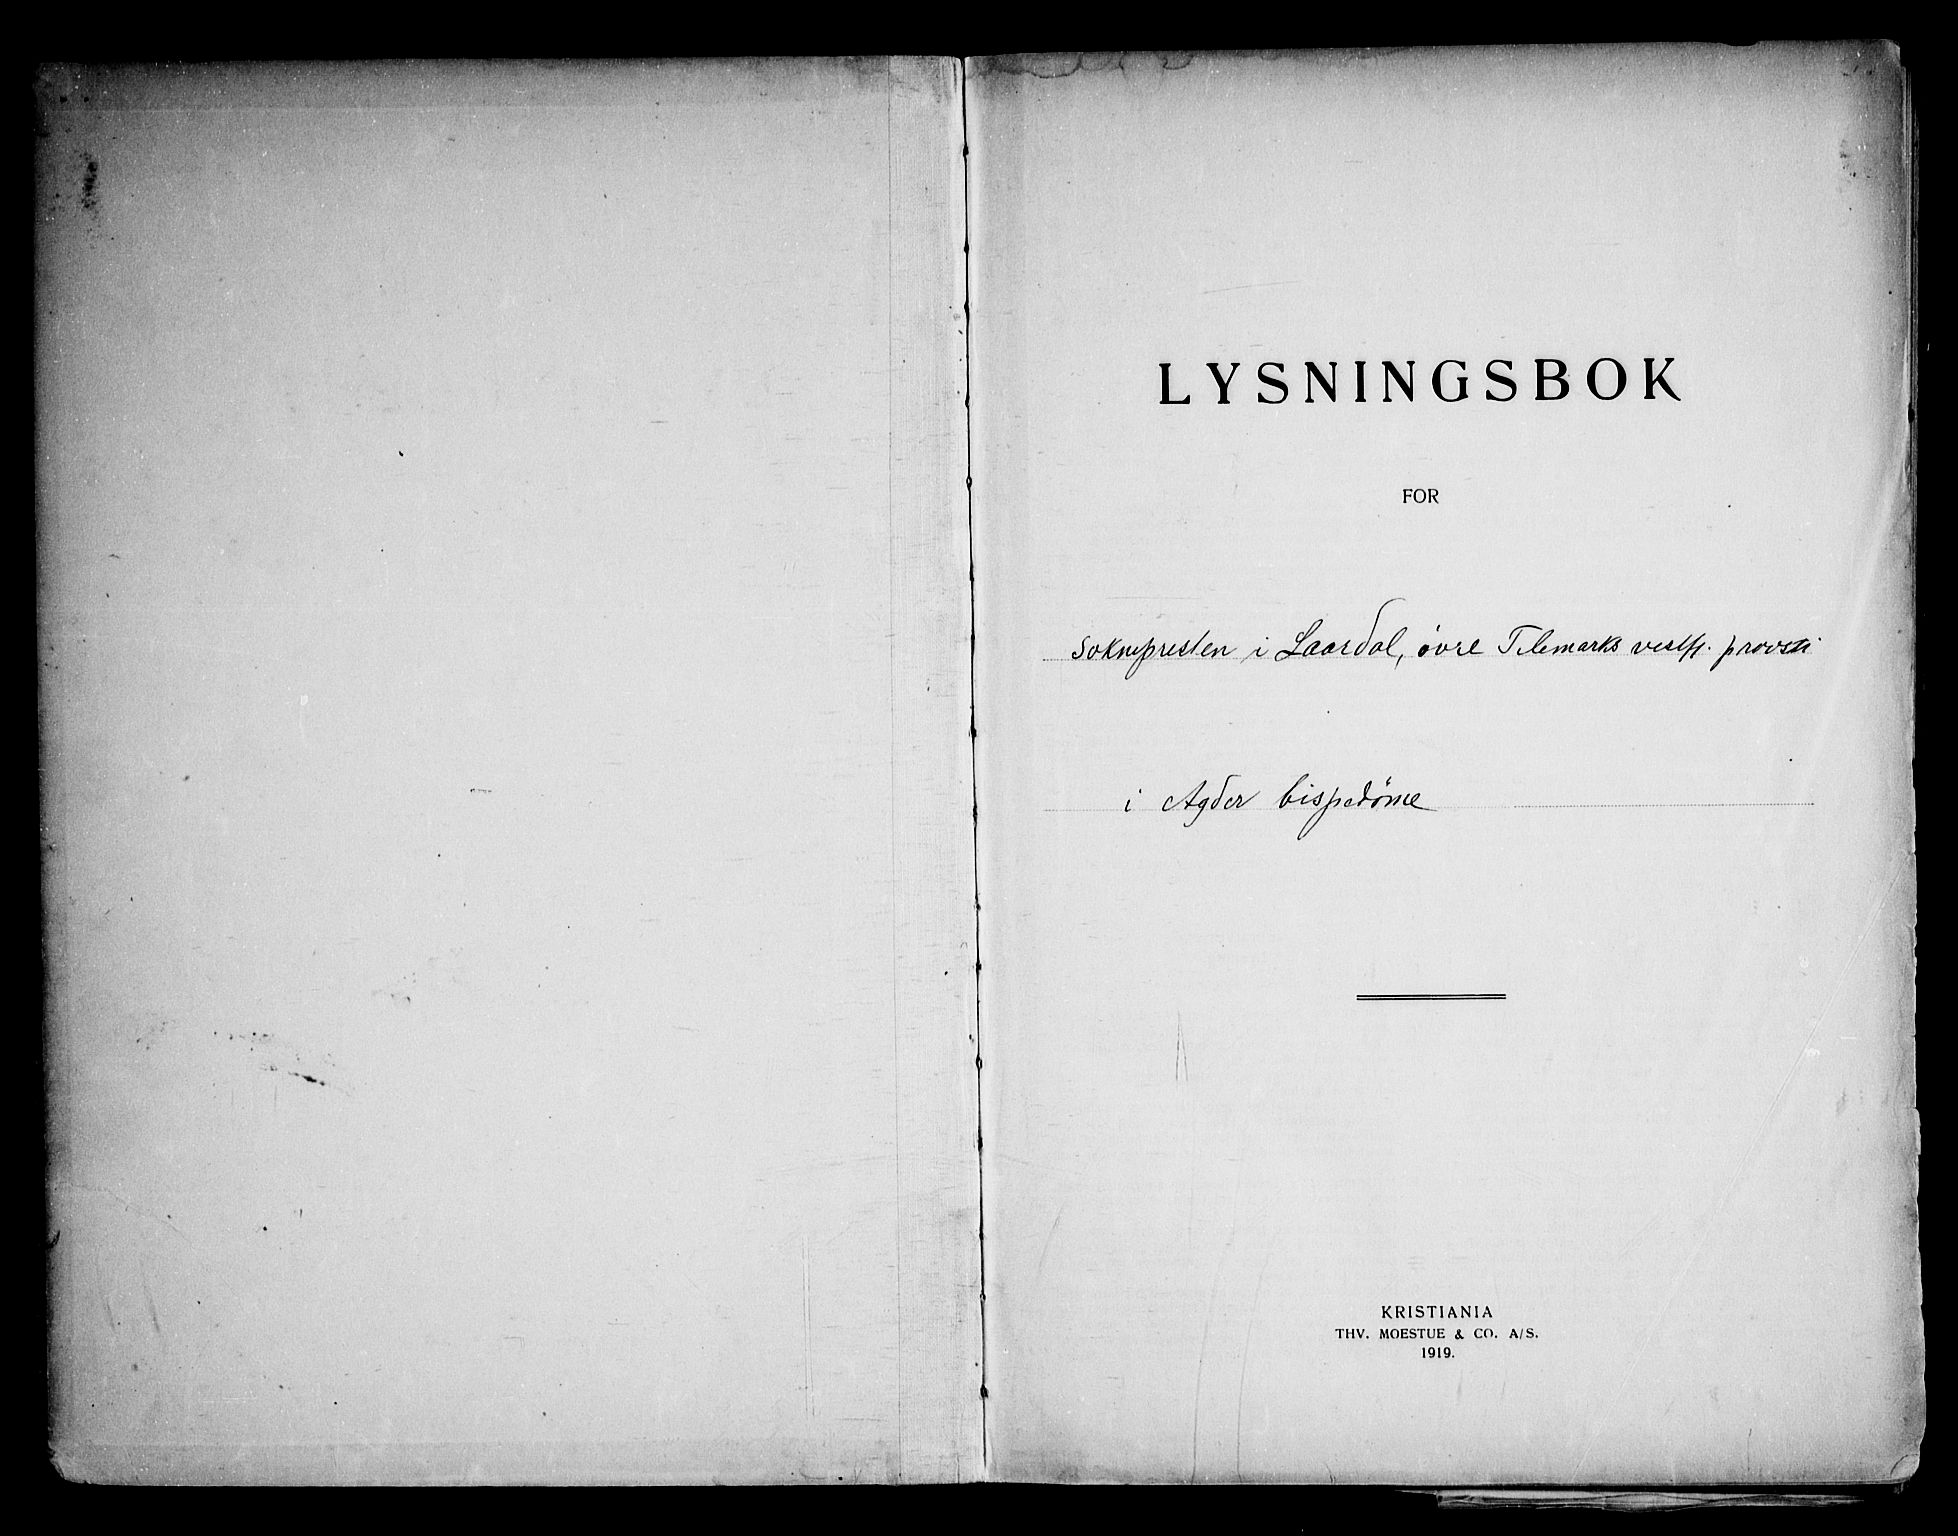 SAKO, Lårdal kirkebøker, H/Ha: Lysningsprotokoll nr. 1, 1919-1969